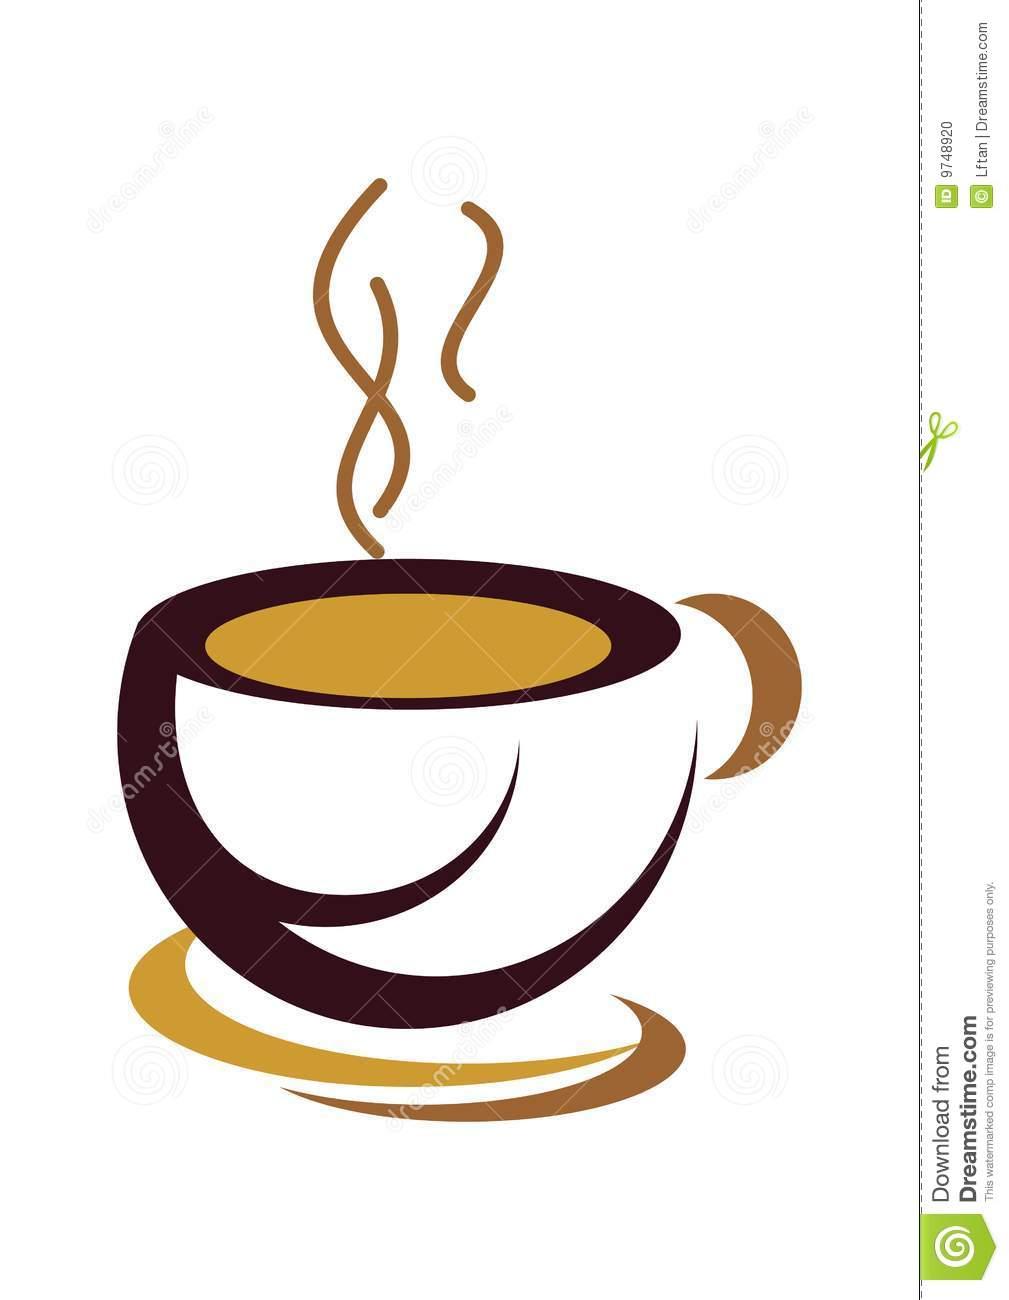 1009x1300 Free Clipart Coffee Cup Steaming D6d6f424abd3aae20355d621d92fa3f4